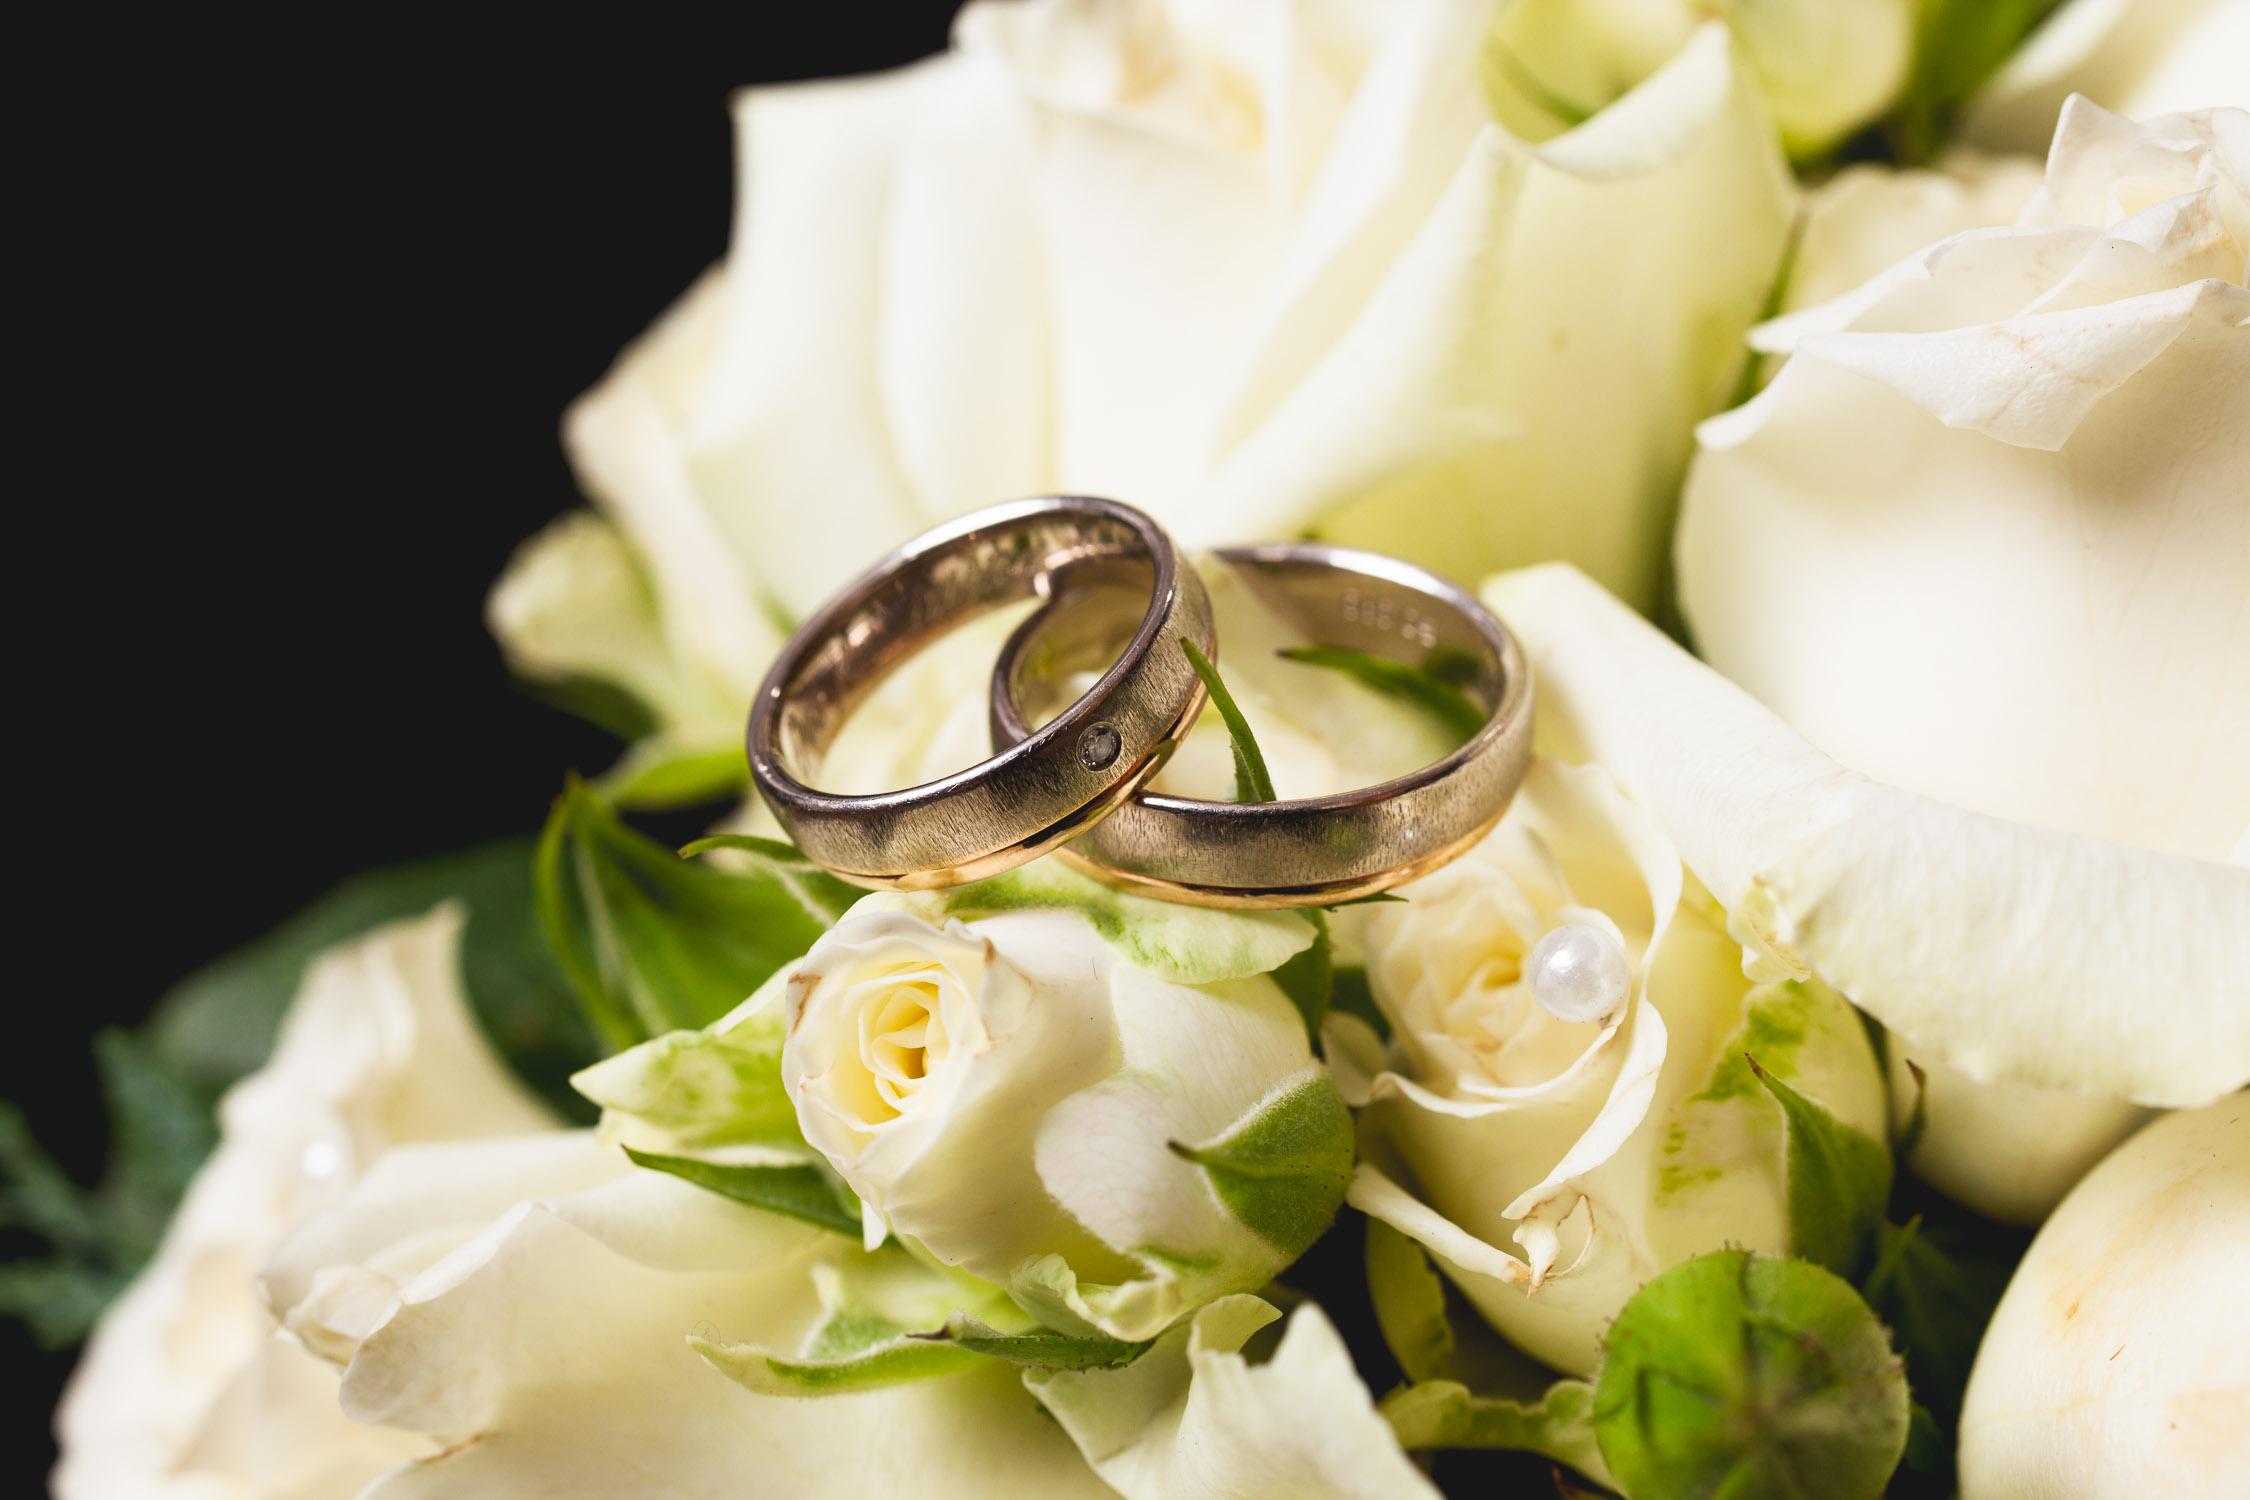 bryllup-bryllupsfotograf-bryllupsfotografering-kjæreste-kjærestefotograf-kjærestefotografering-sarpsborg-hodne-design-pål-hodne-2